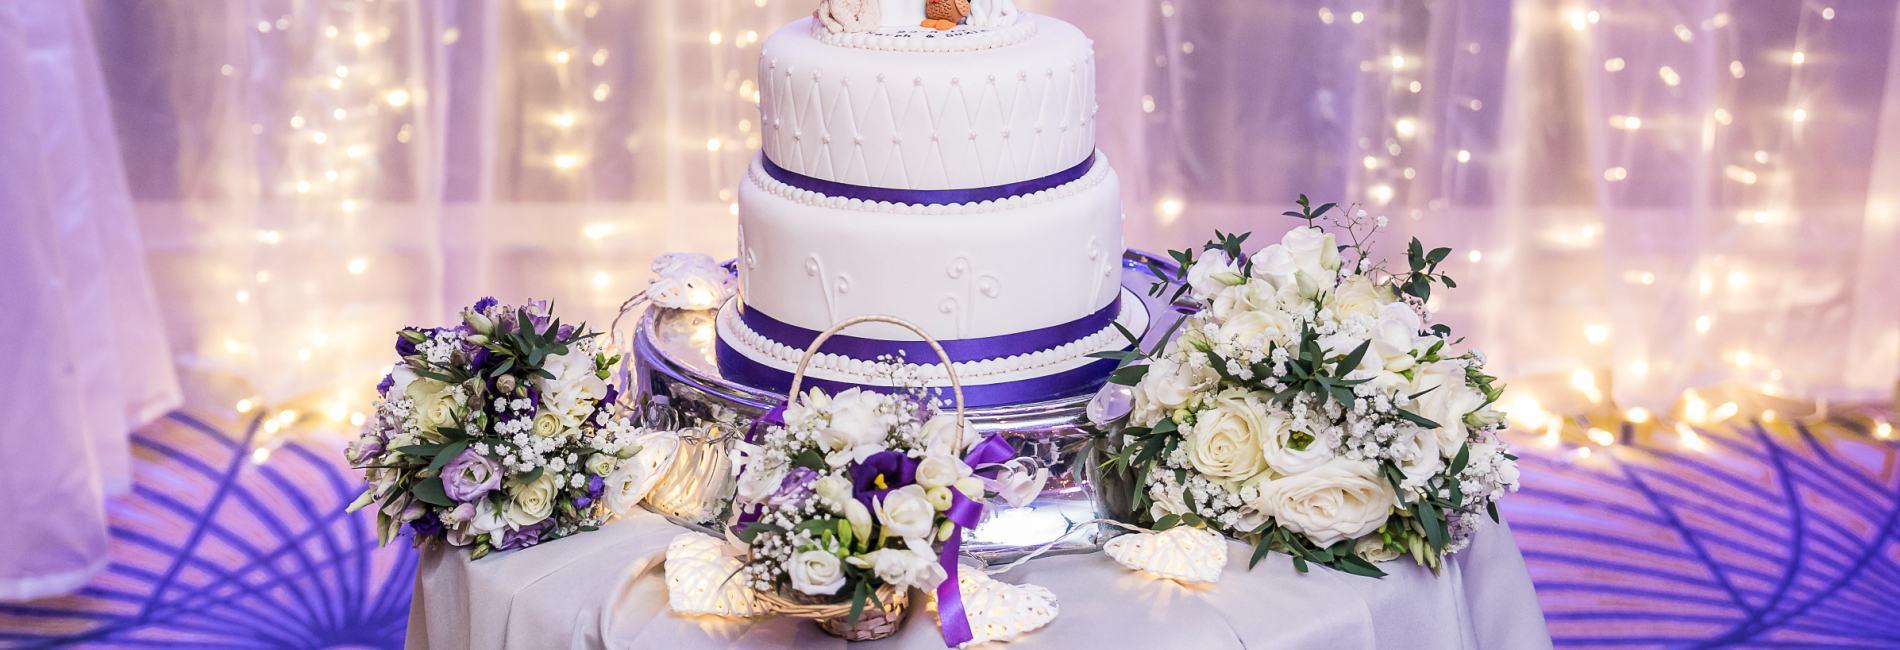 Arklow Bay Hotel wedding cake